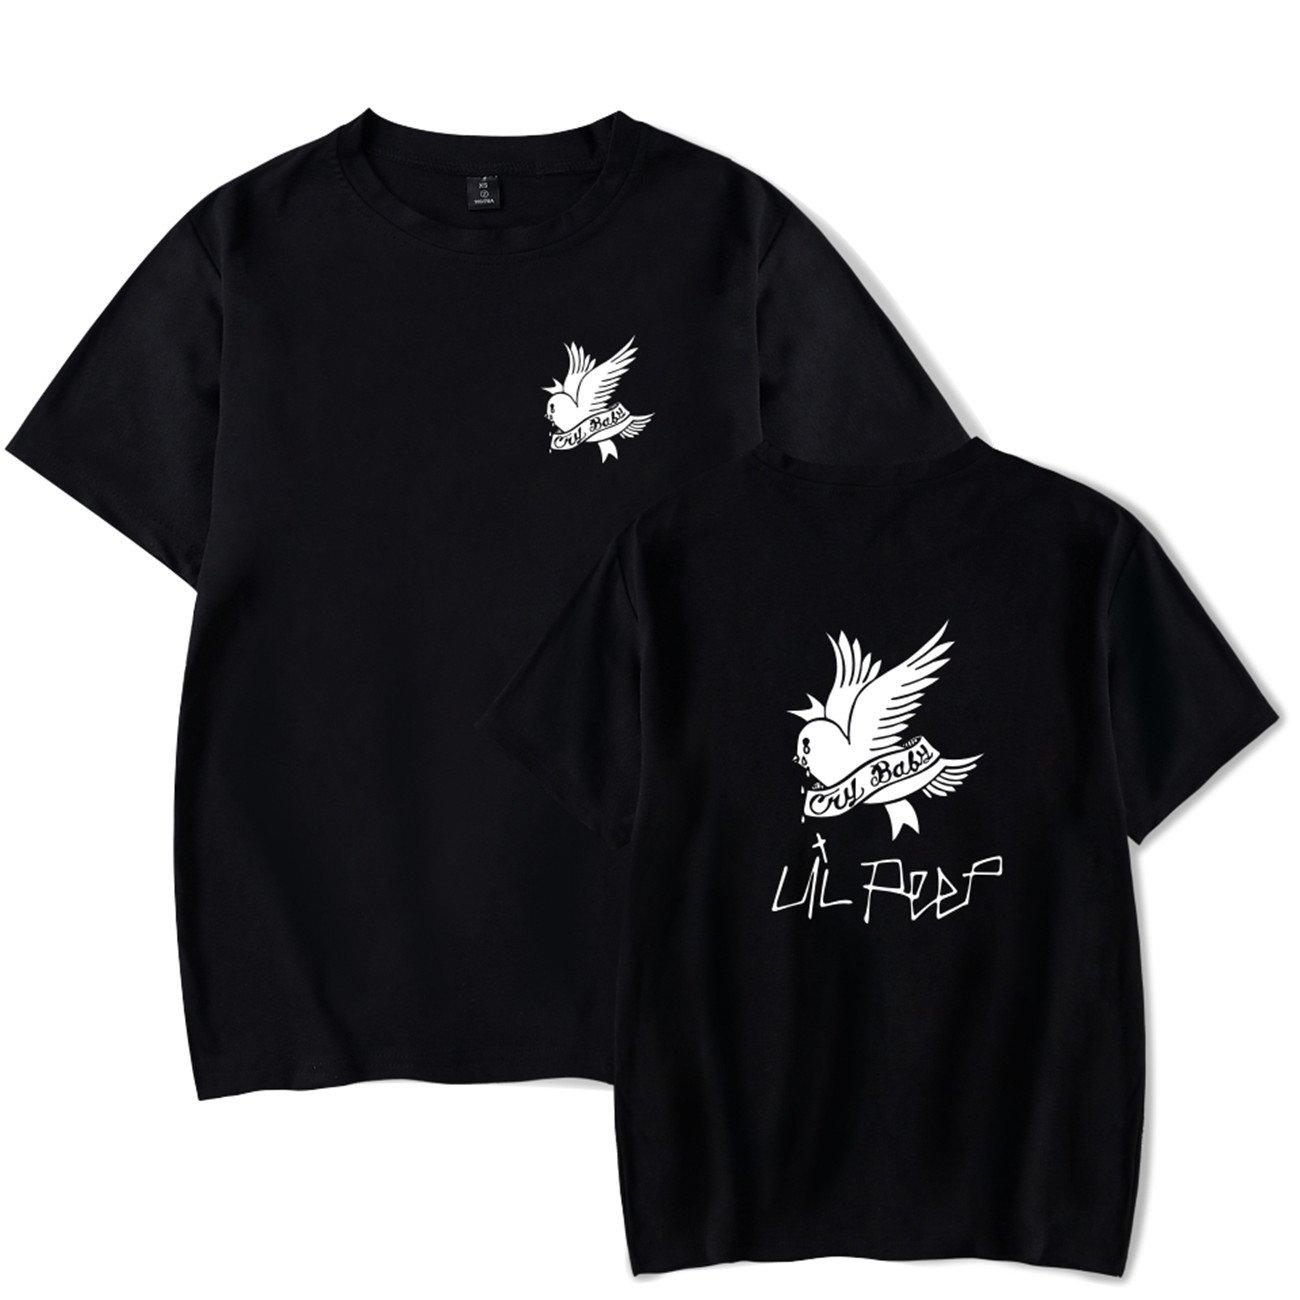 4a40021d0d1f SERAPHY Unisex Tshirt Lil Peep Cry Baby Rapper Hip Hop Spring Mens T ...